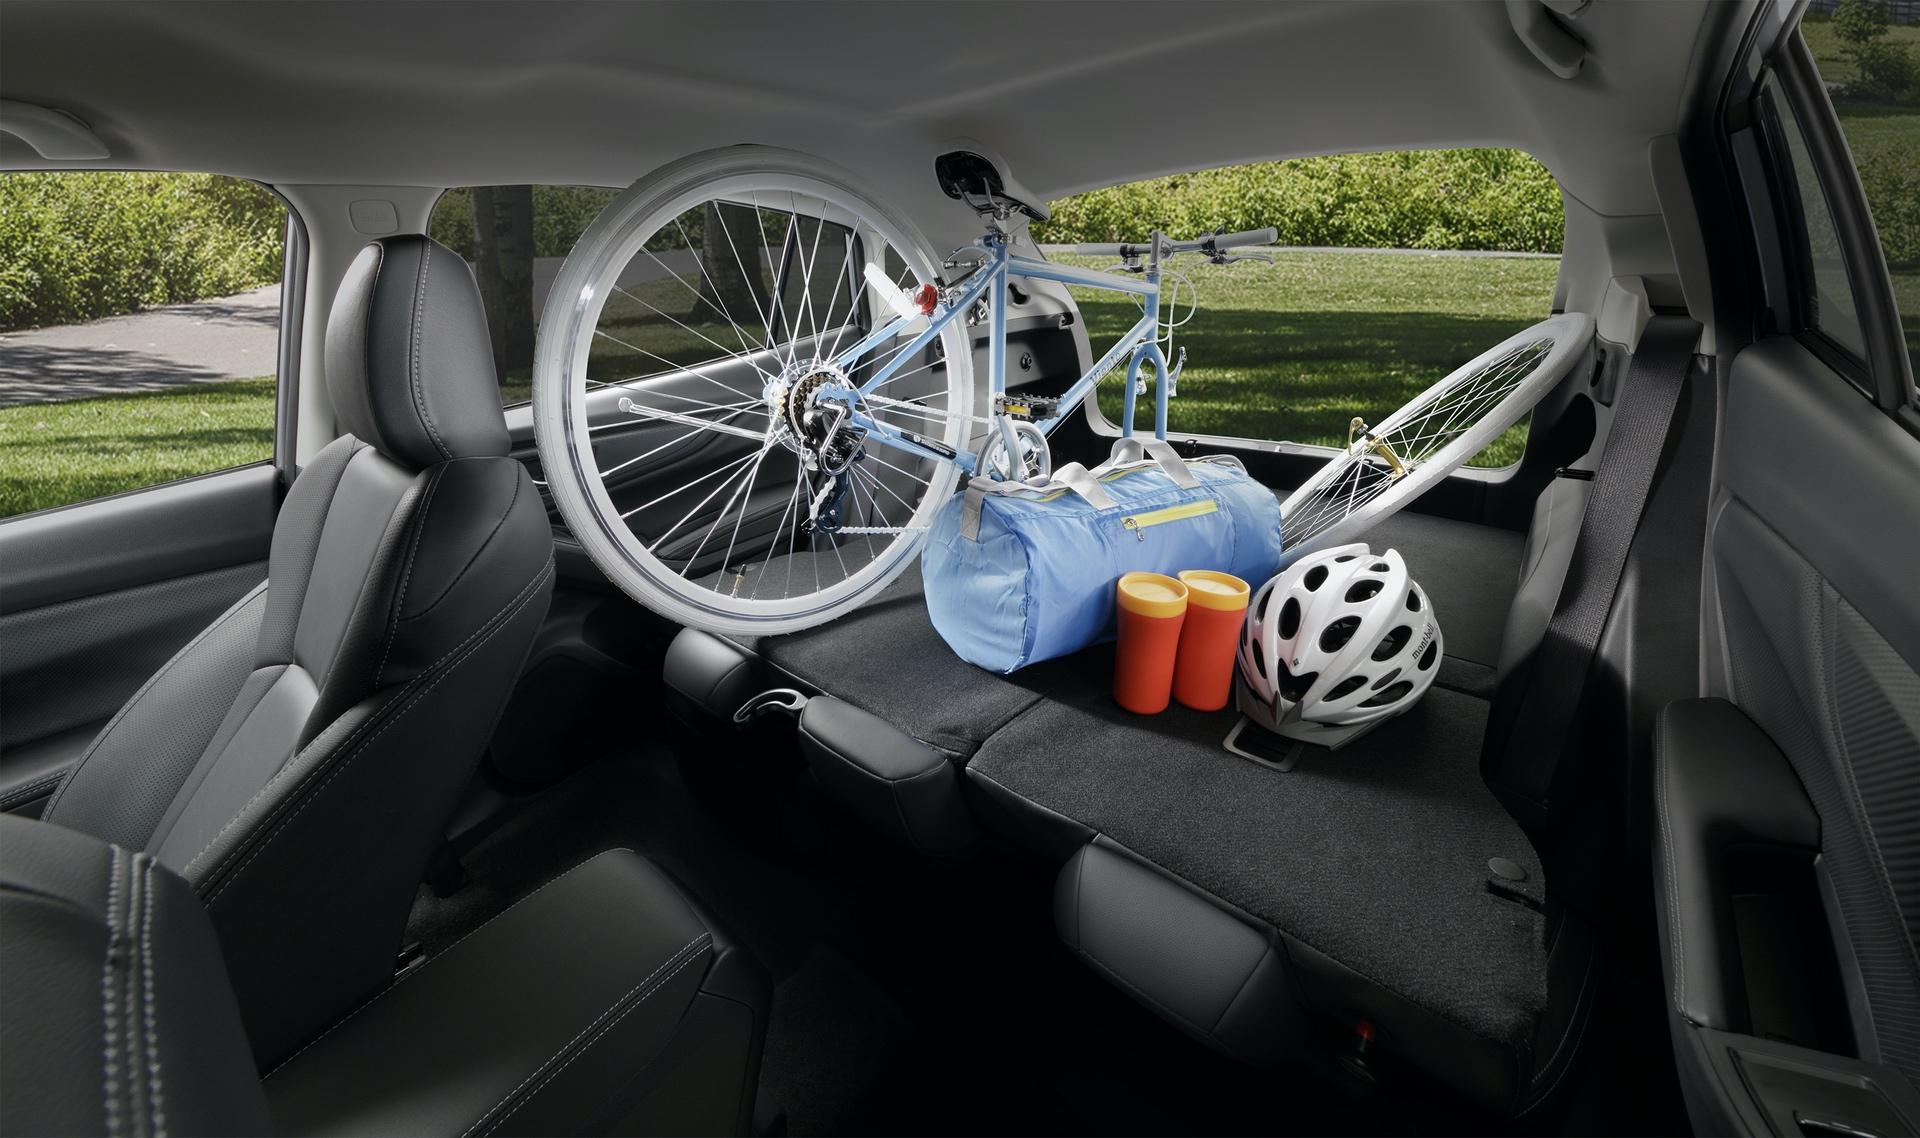 First_Drive_Subaru_Impreza_0034